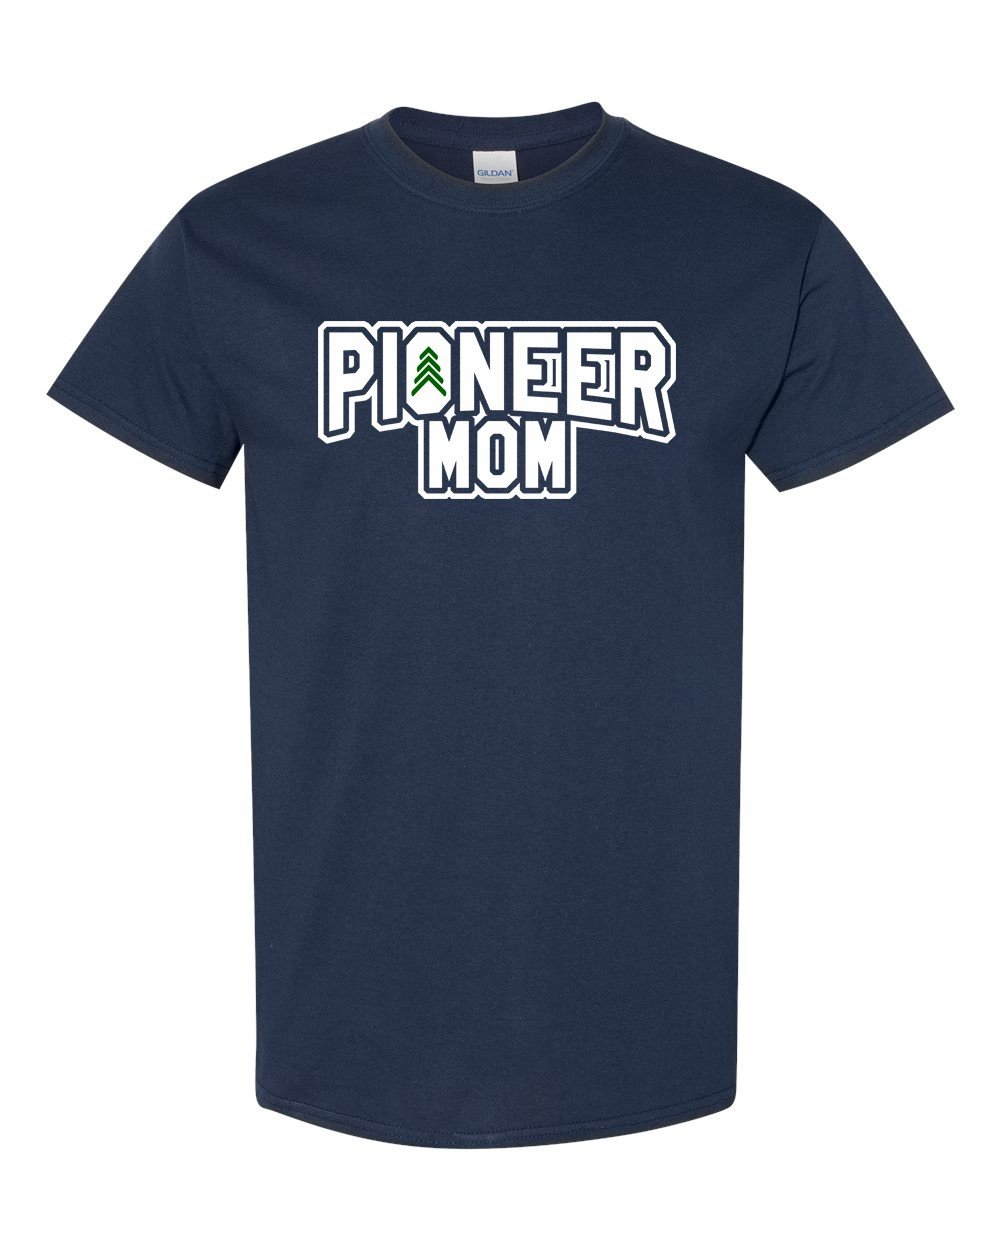 Pioneer Mom 100% Pre-Shrunk Cotton Tees